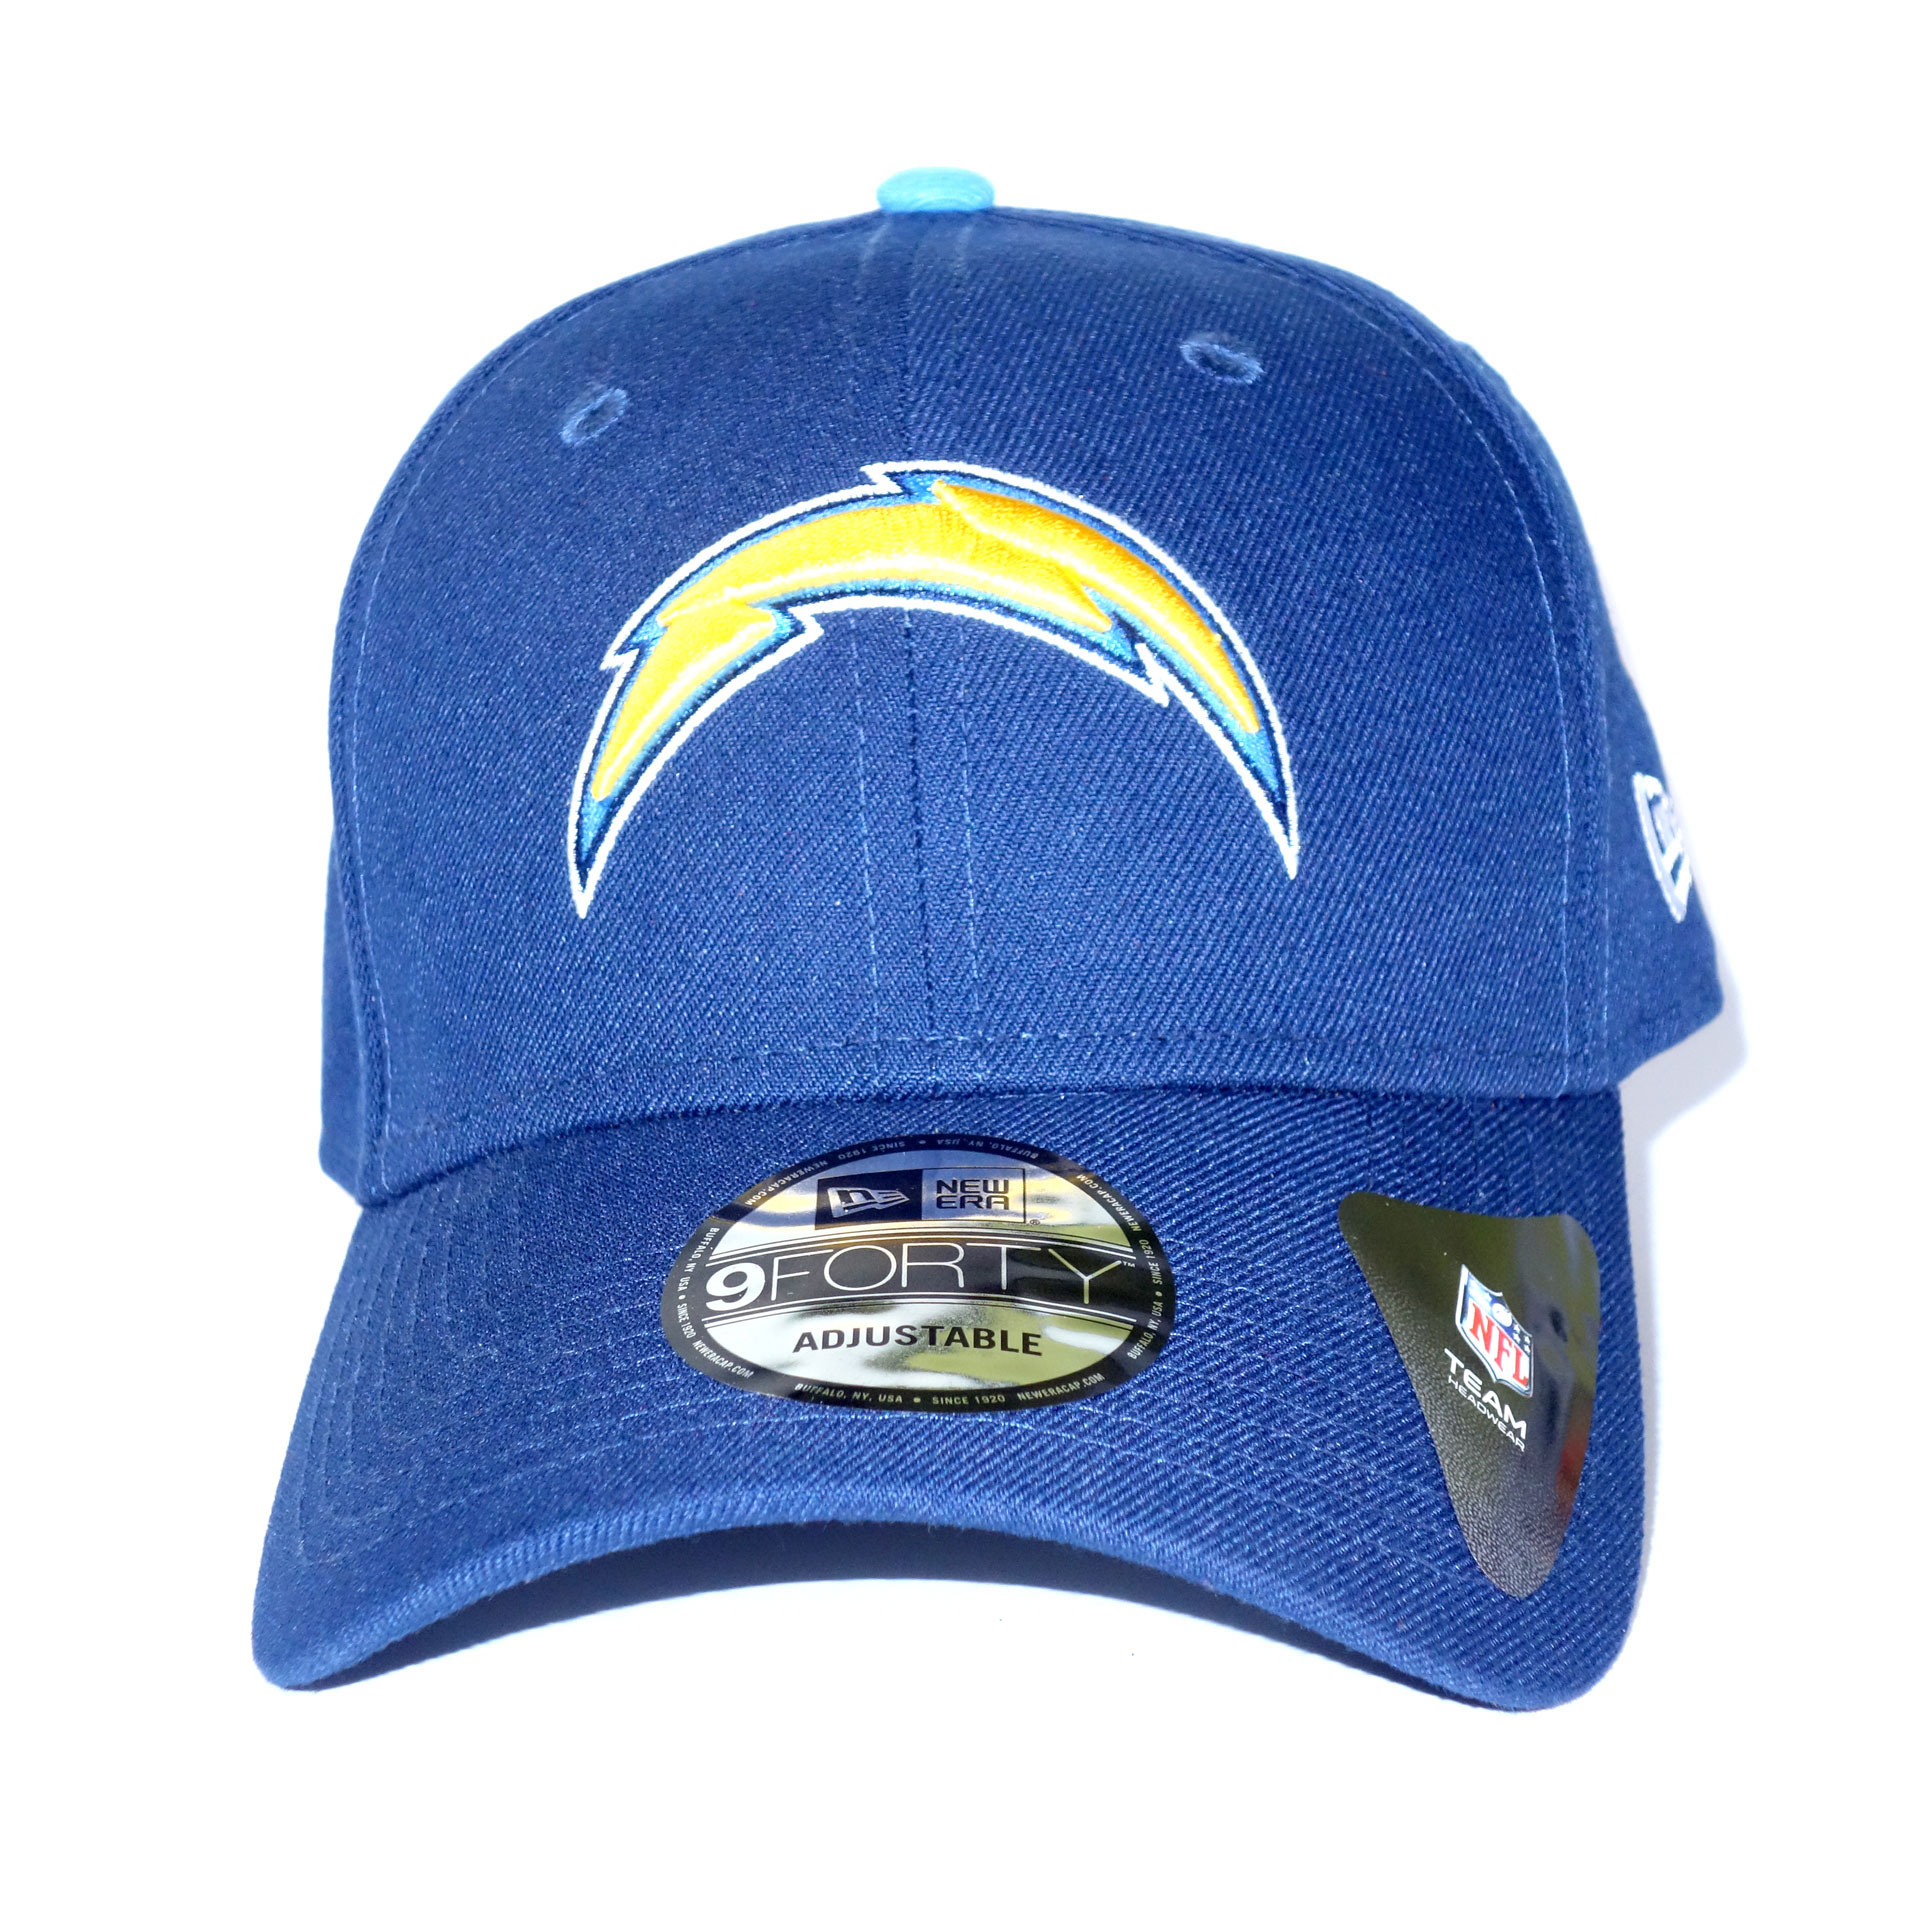 NFL New Era Cap Los Angeles Chargers